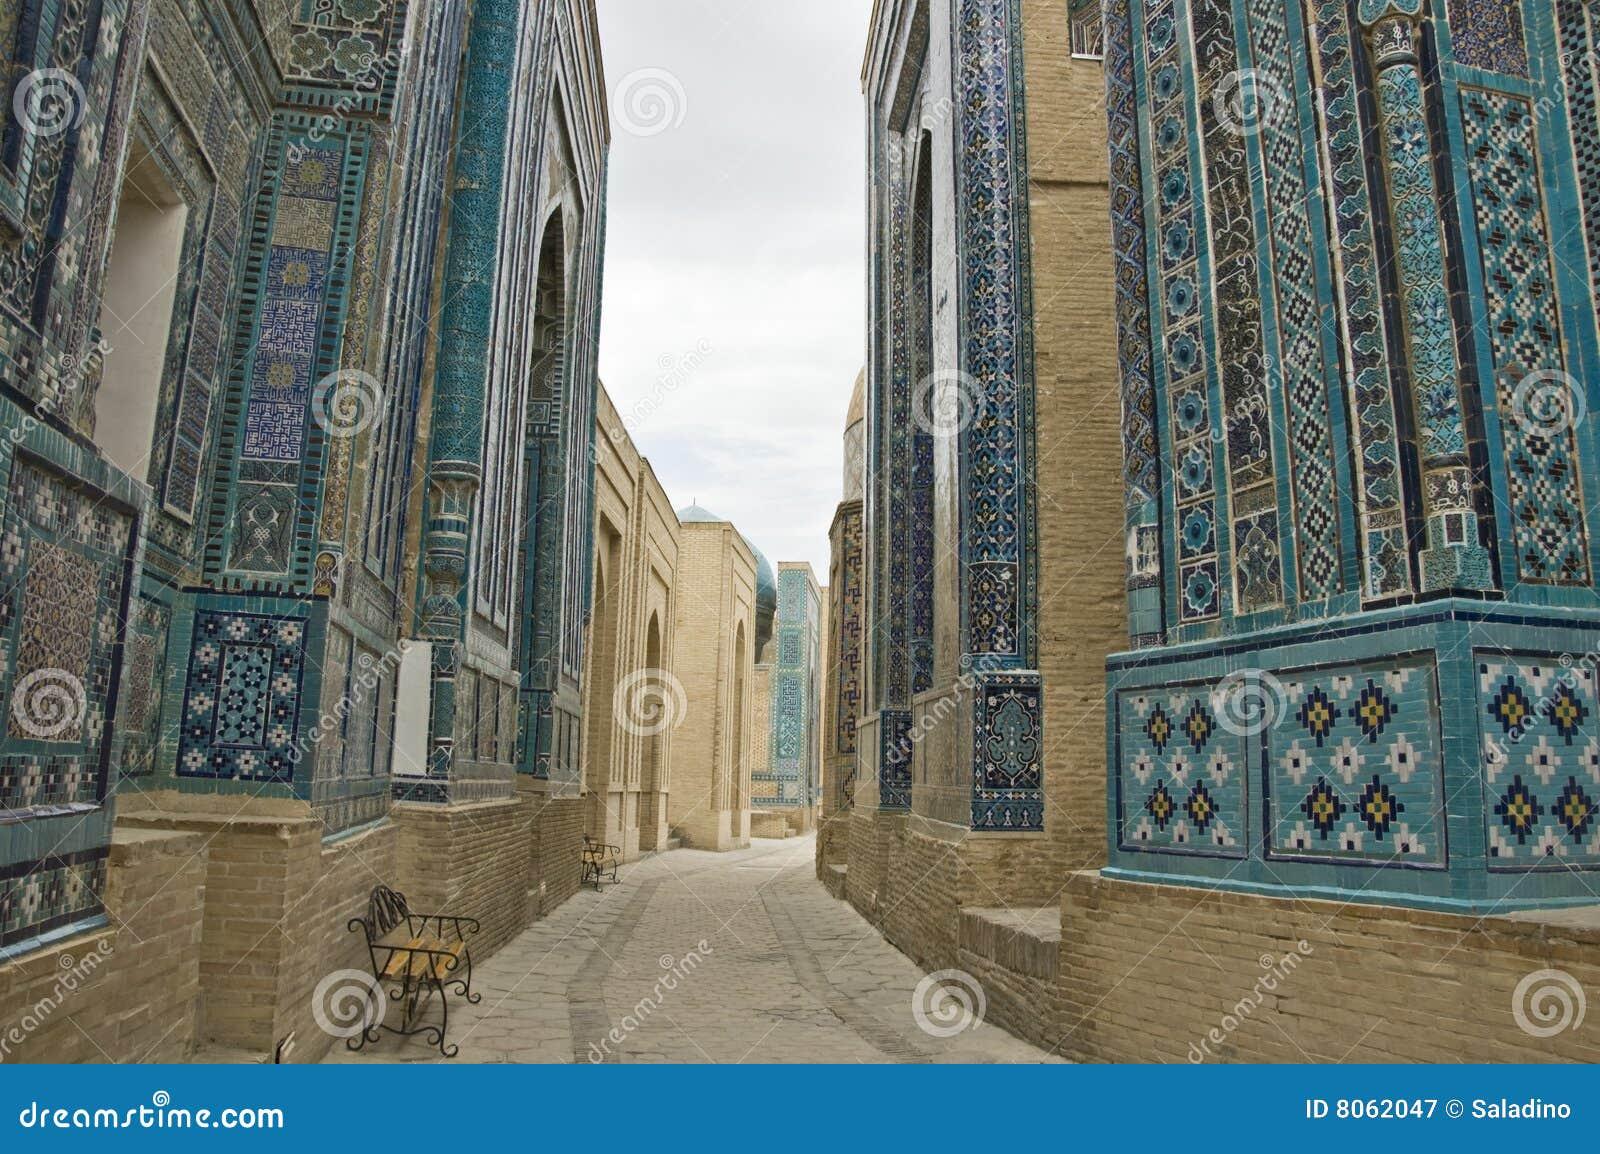 Necropolis in Samarkand